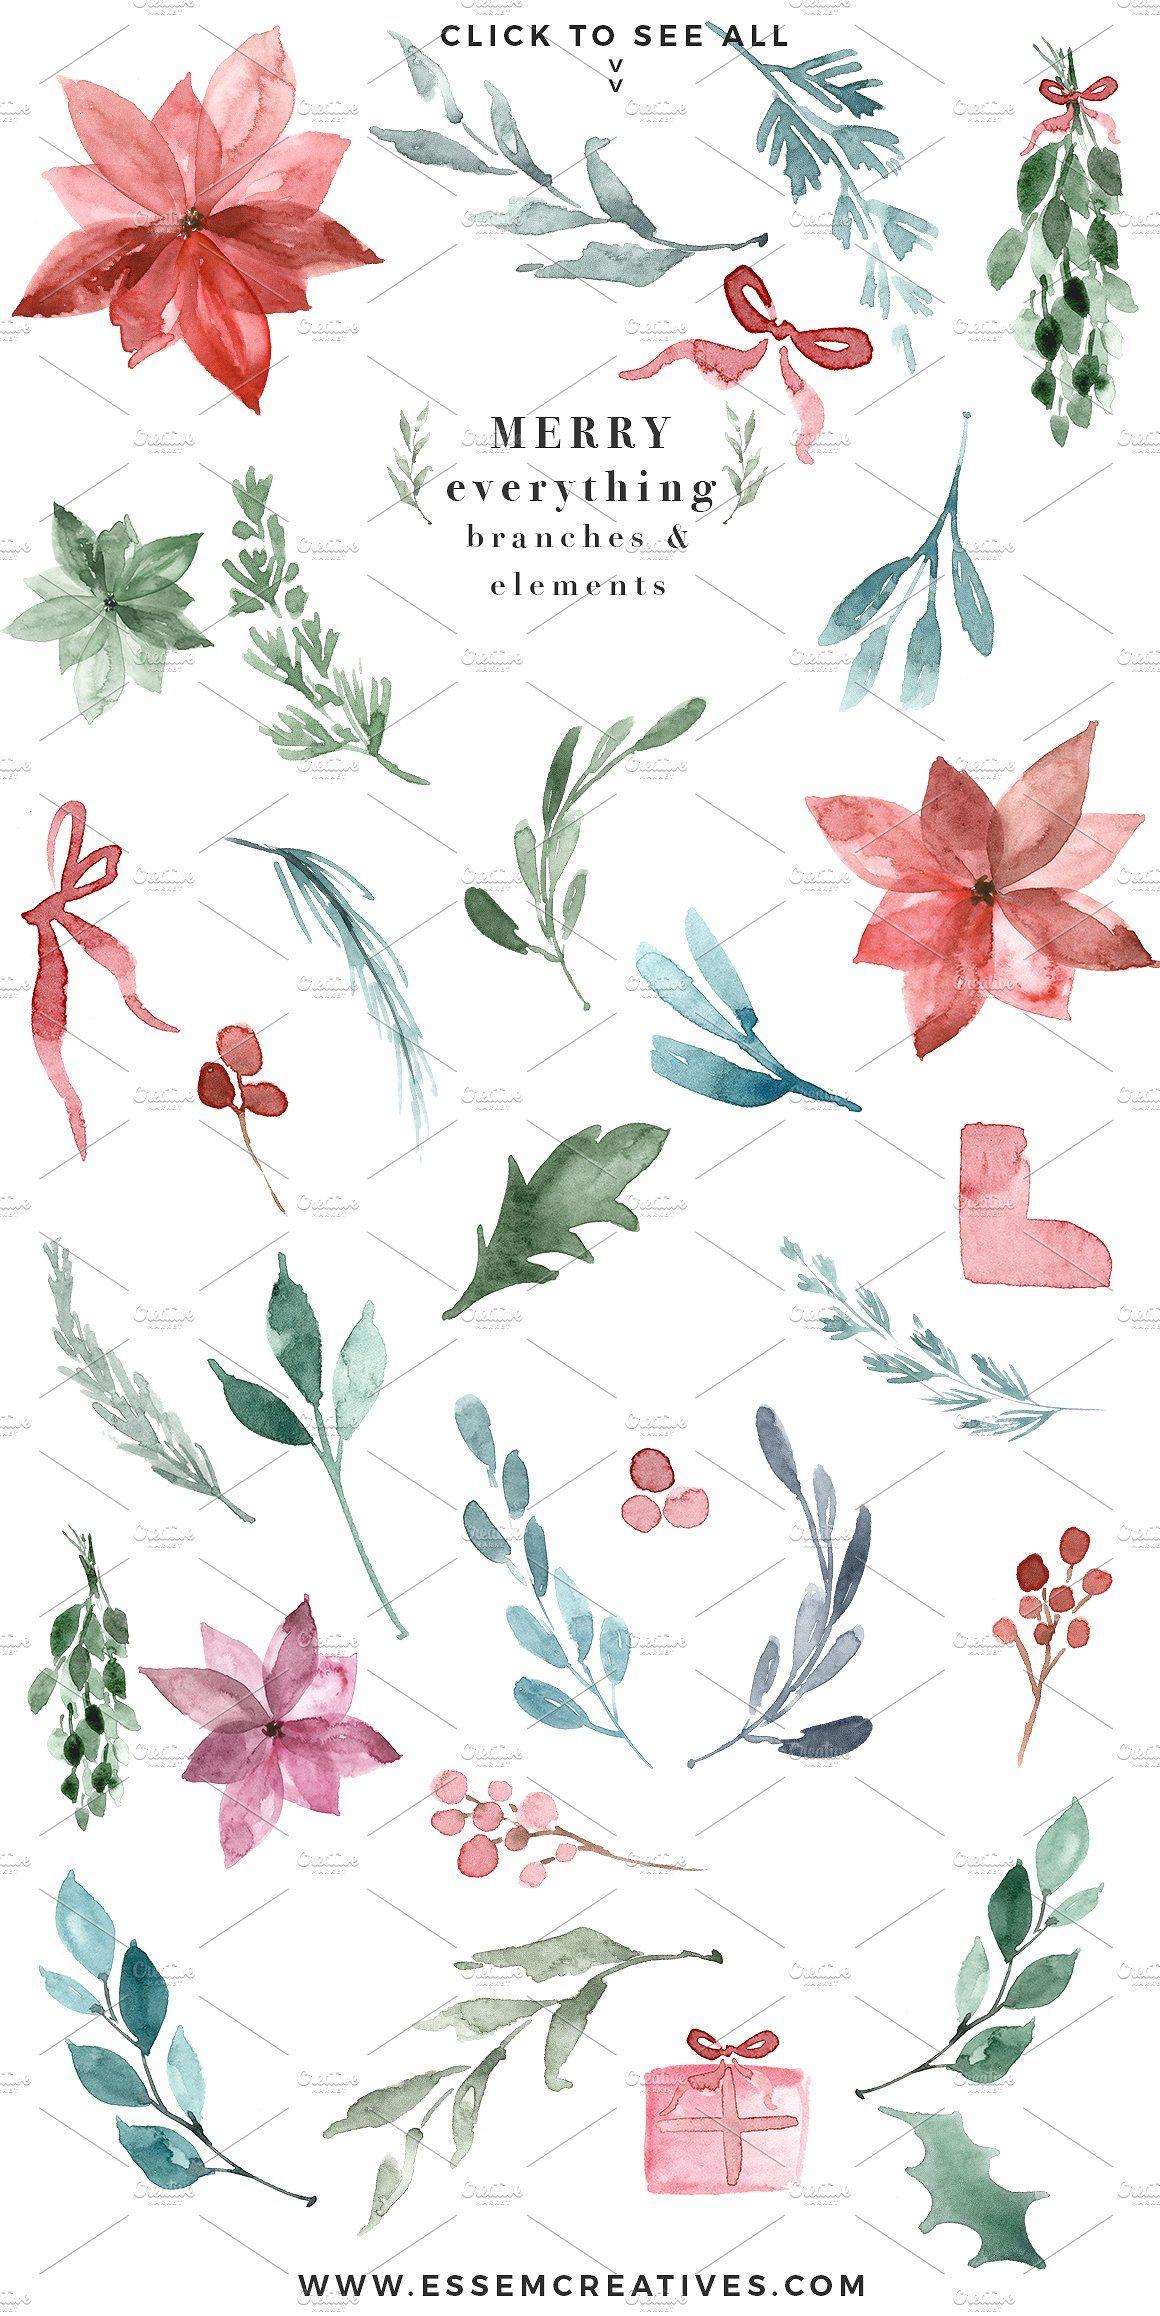 Merry Christmas Wreath Card Clipart by Essem Creatives on